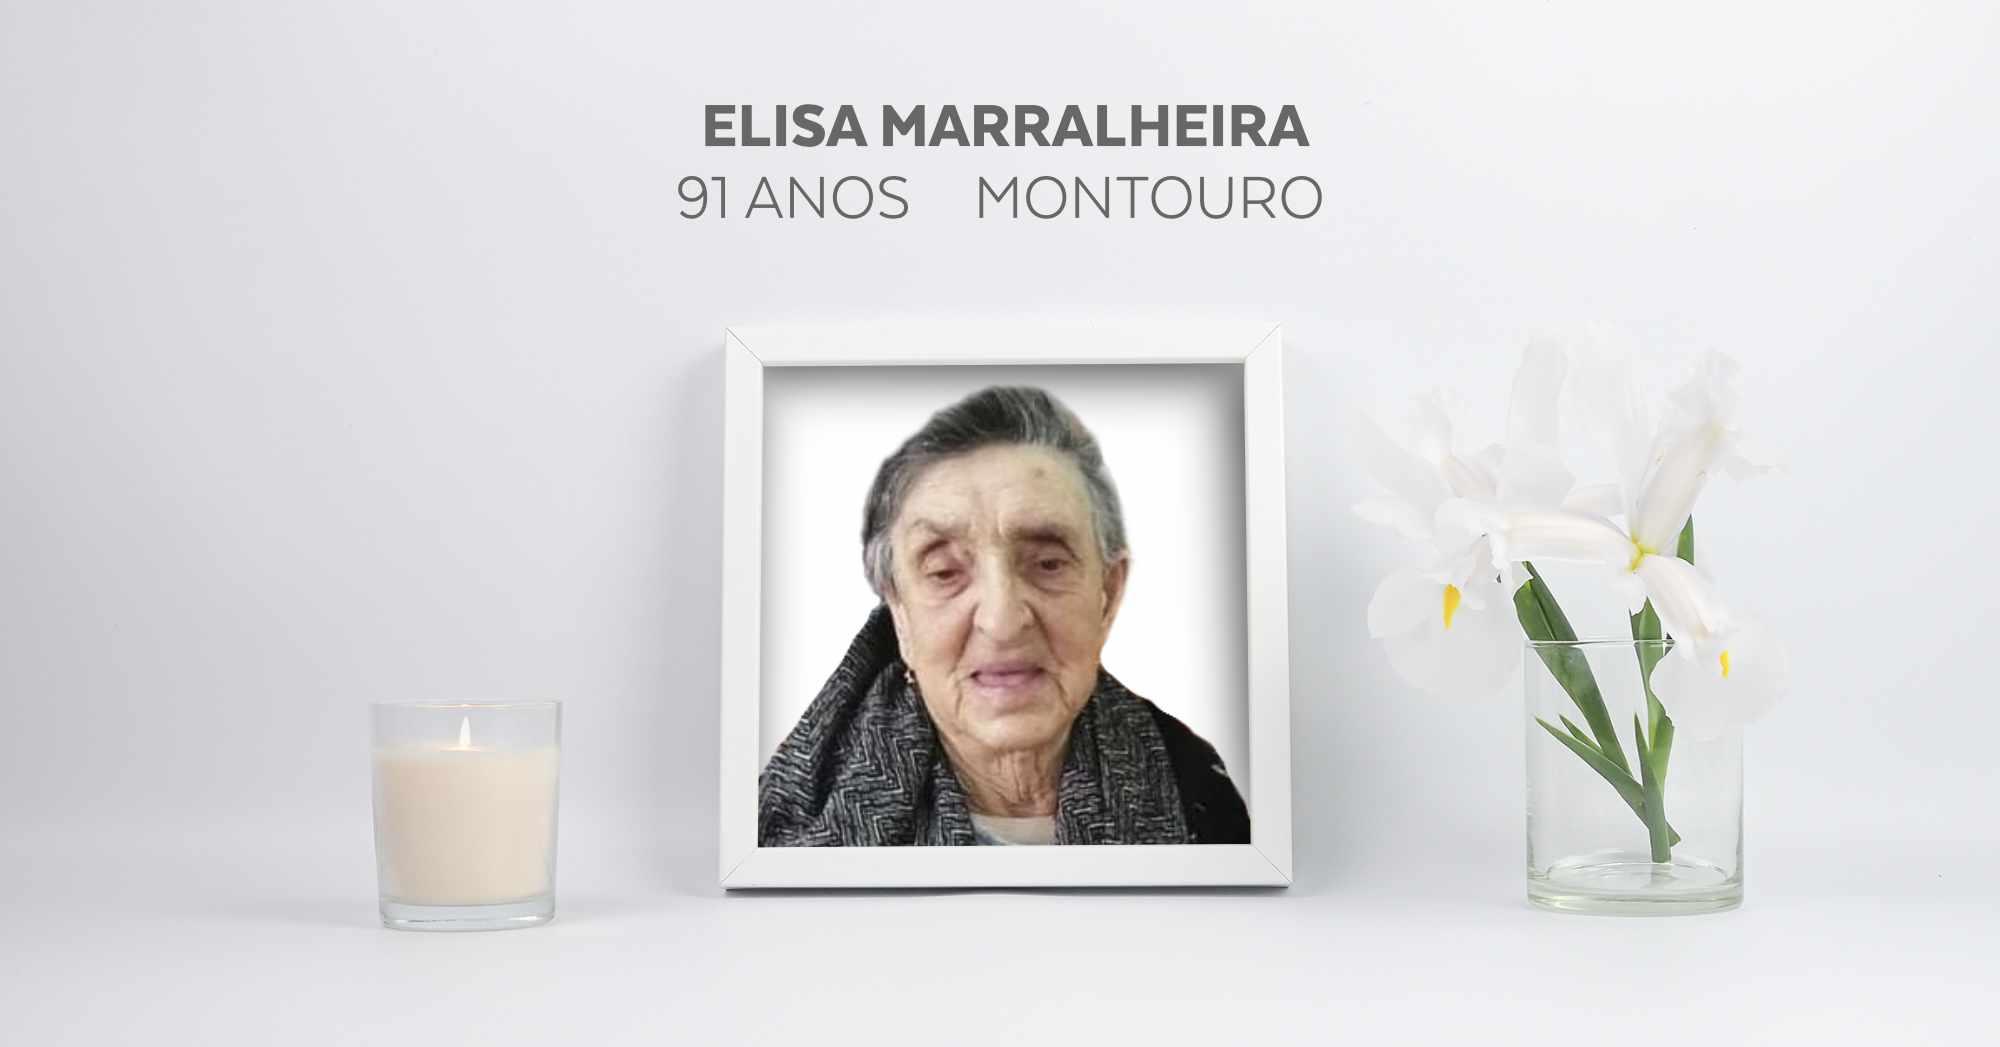 Elisa Marralheira